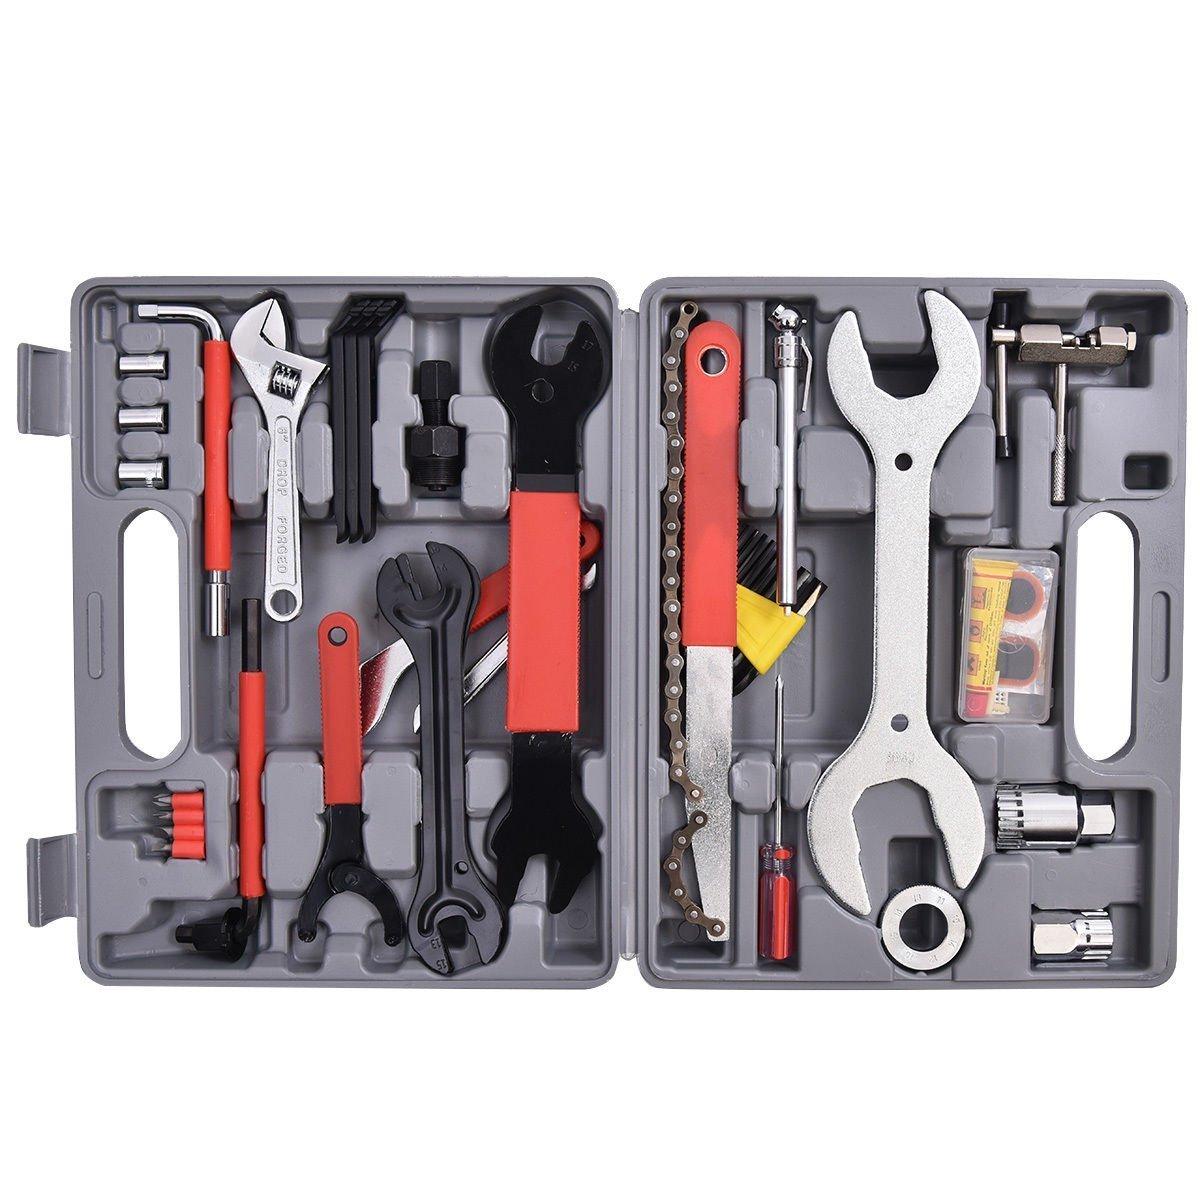 Goplusつ 44 PC Multi-Function Bike Bicycle Repair Tools Tool Kit Set Home Mechanic Box Cycling by Goplus   B01FTXYX1O